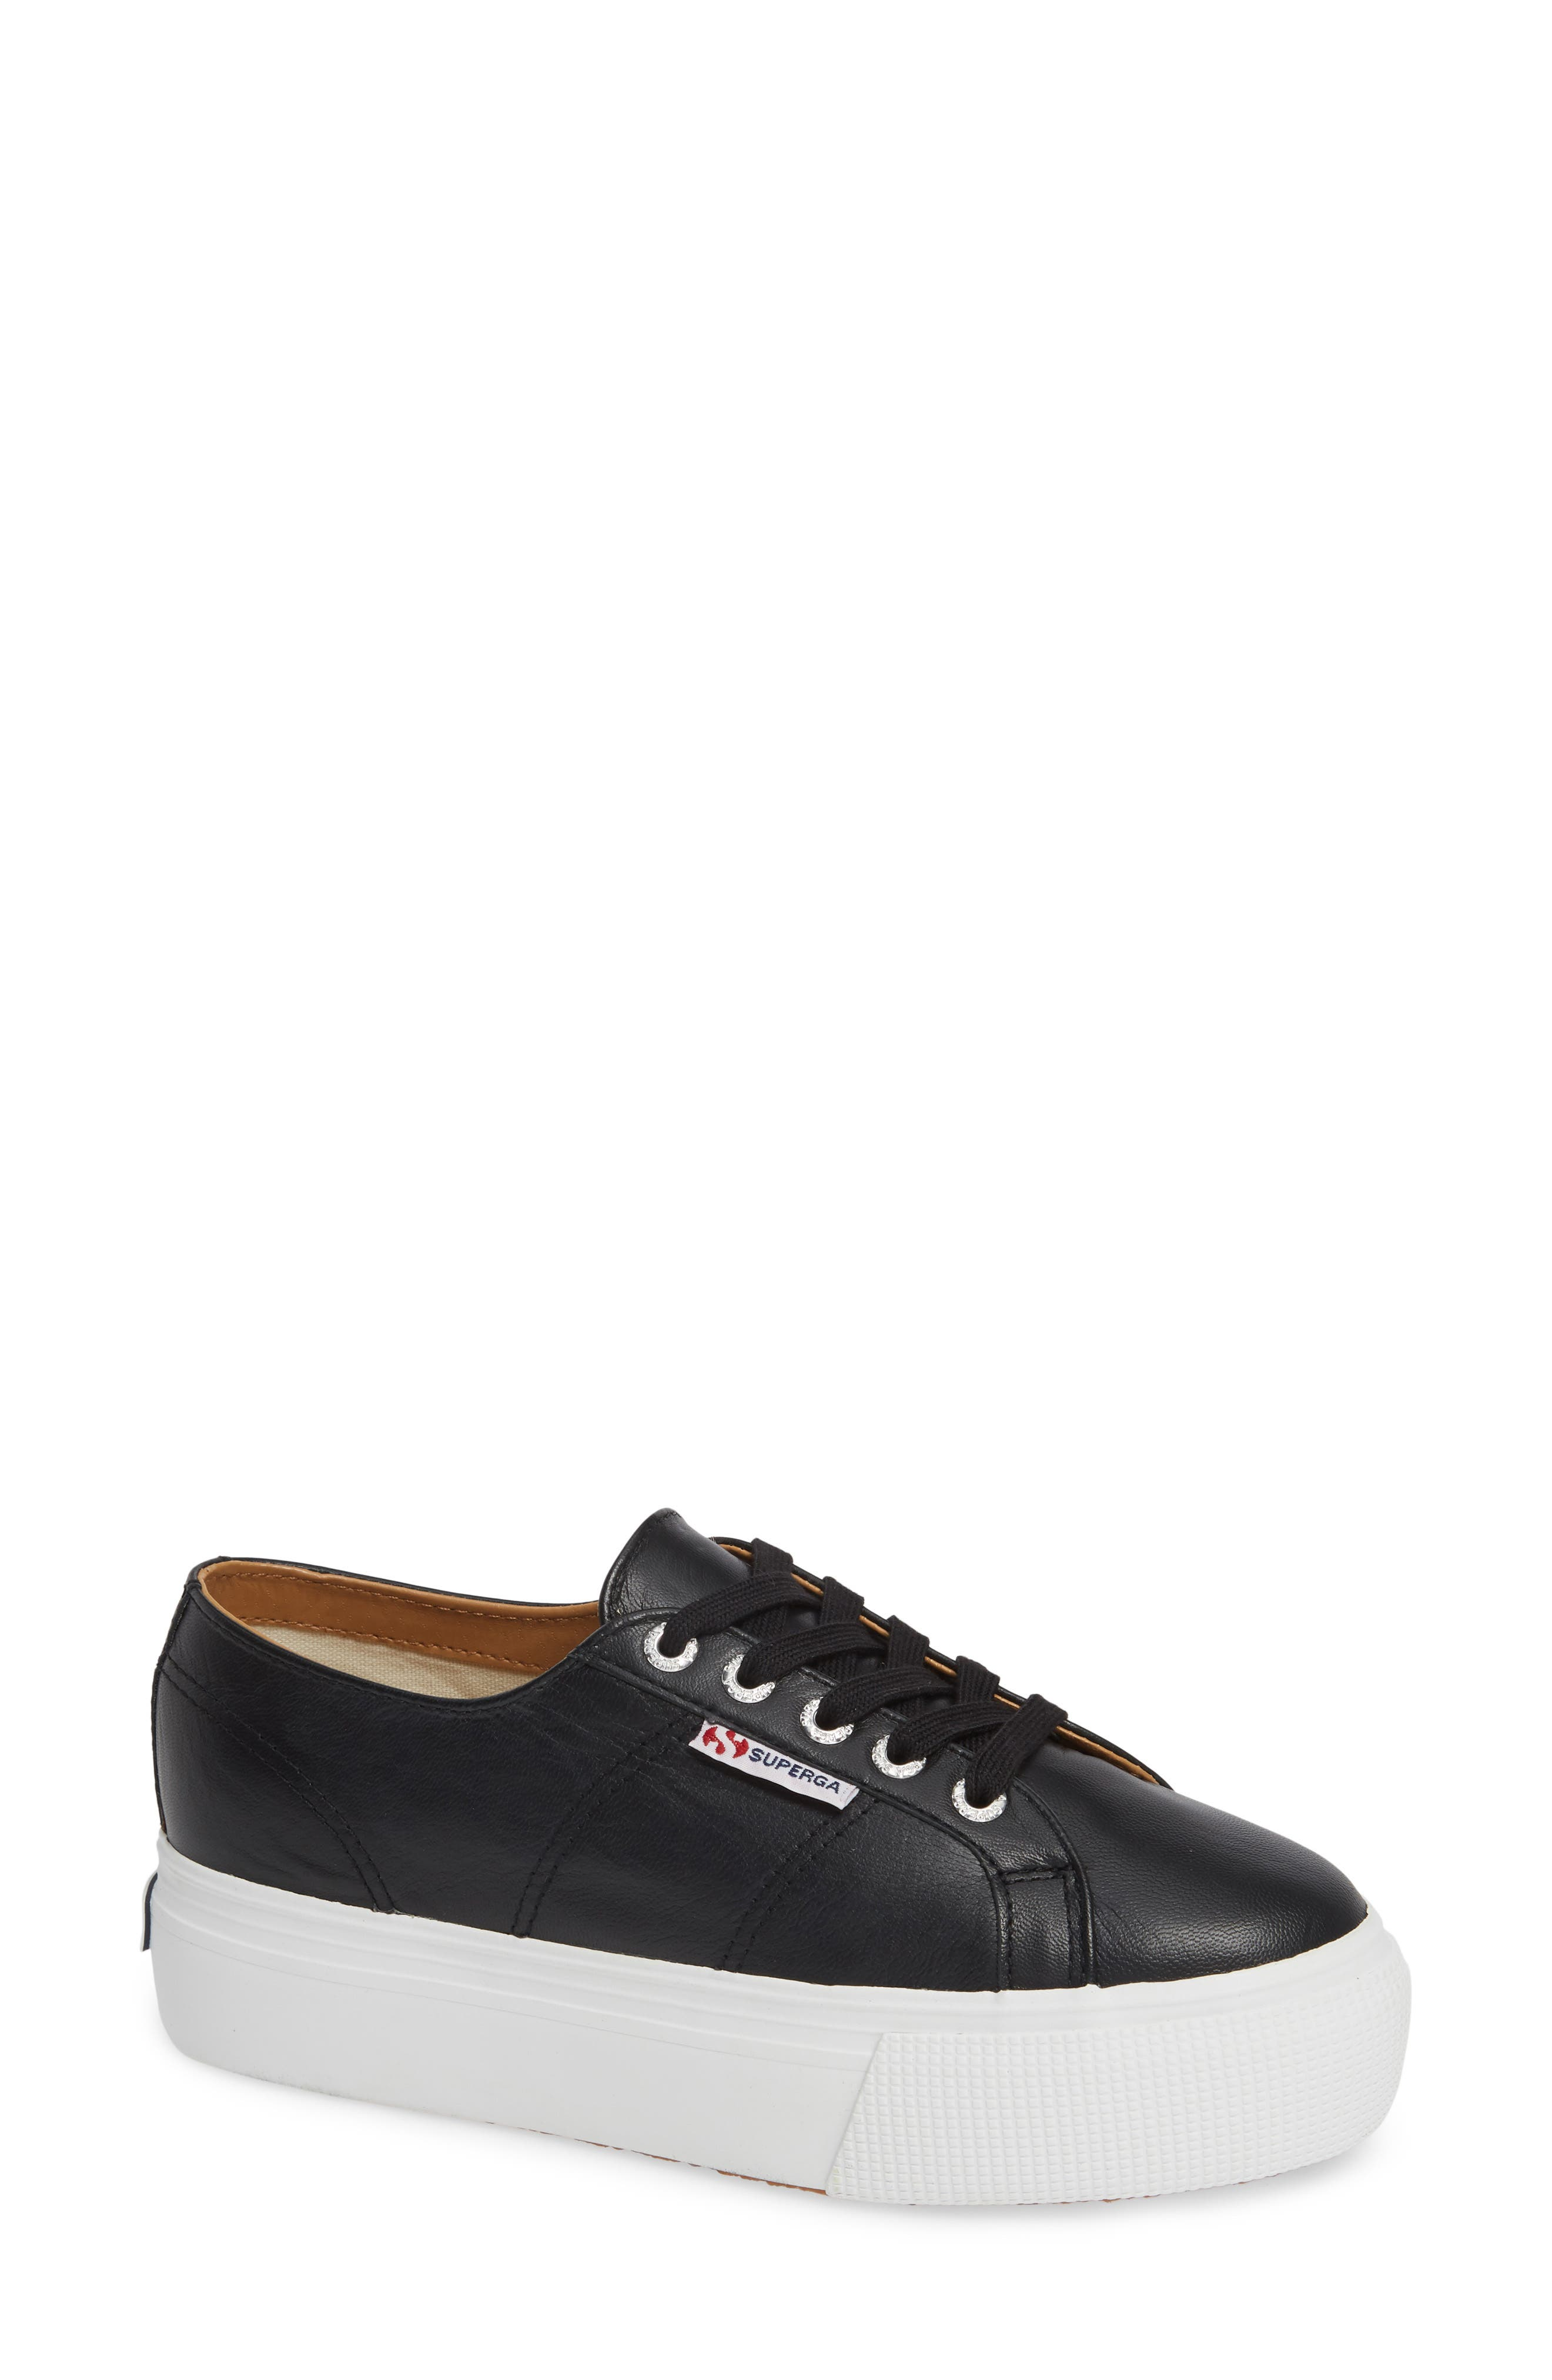 d1b12d519e4 Superga Shoes   Sneakers